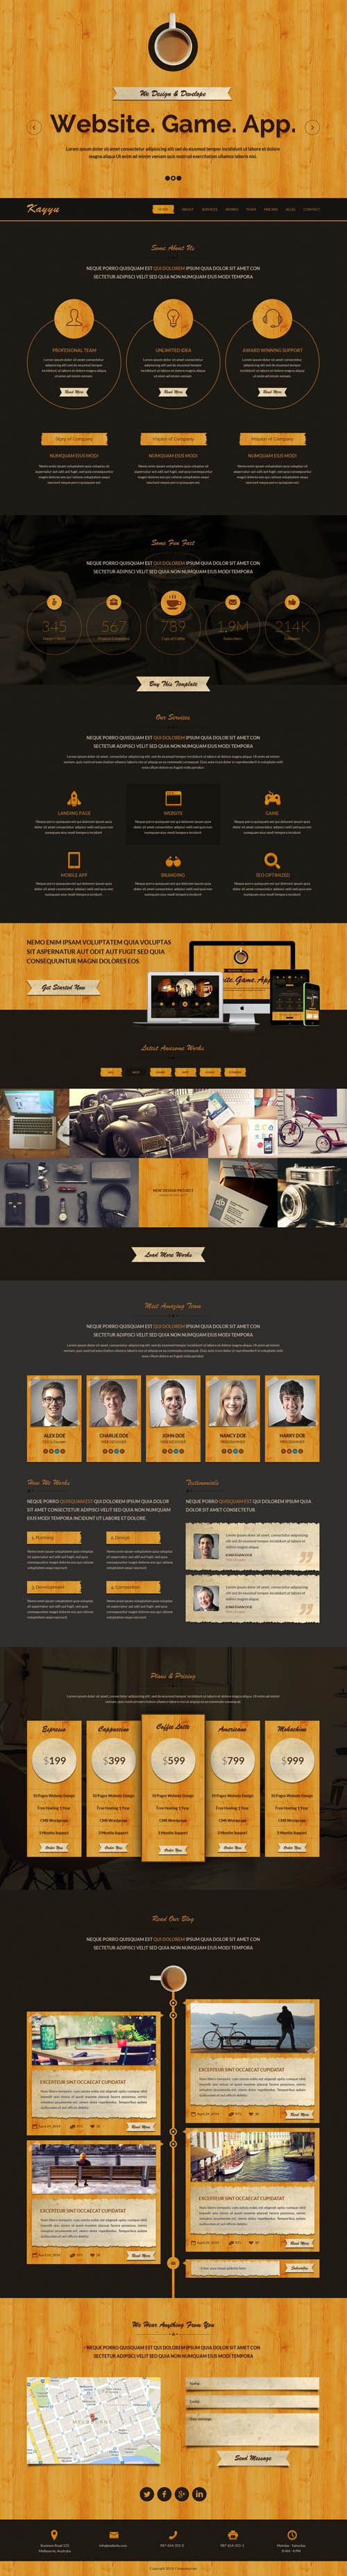 Kayyu One Page PSD Template #html5 #websitedesign #webdesign #html5templates